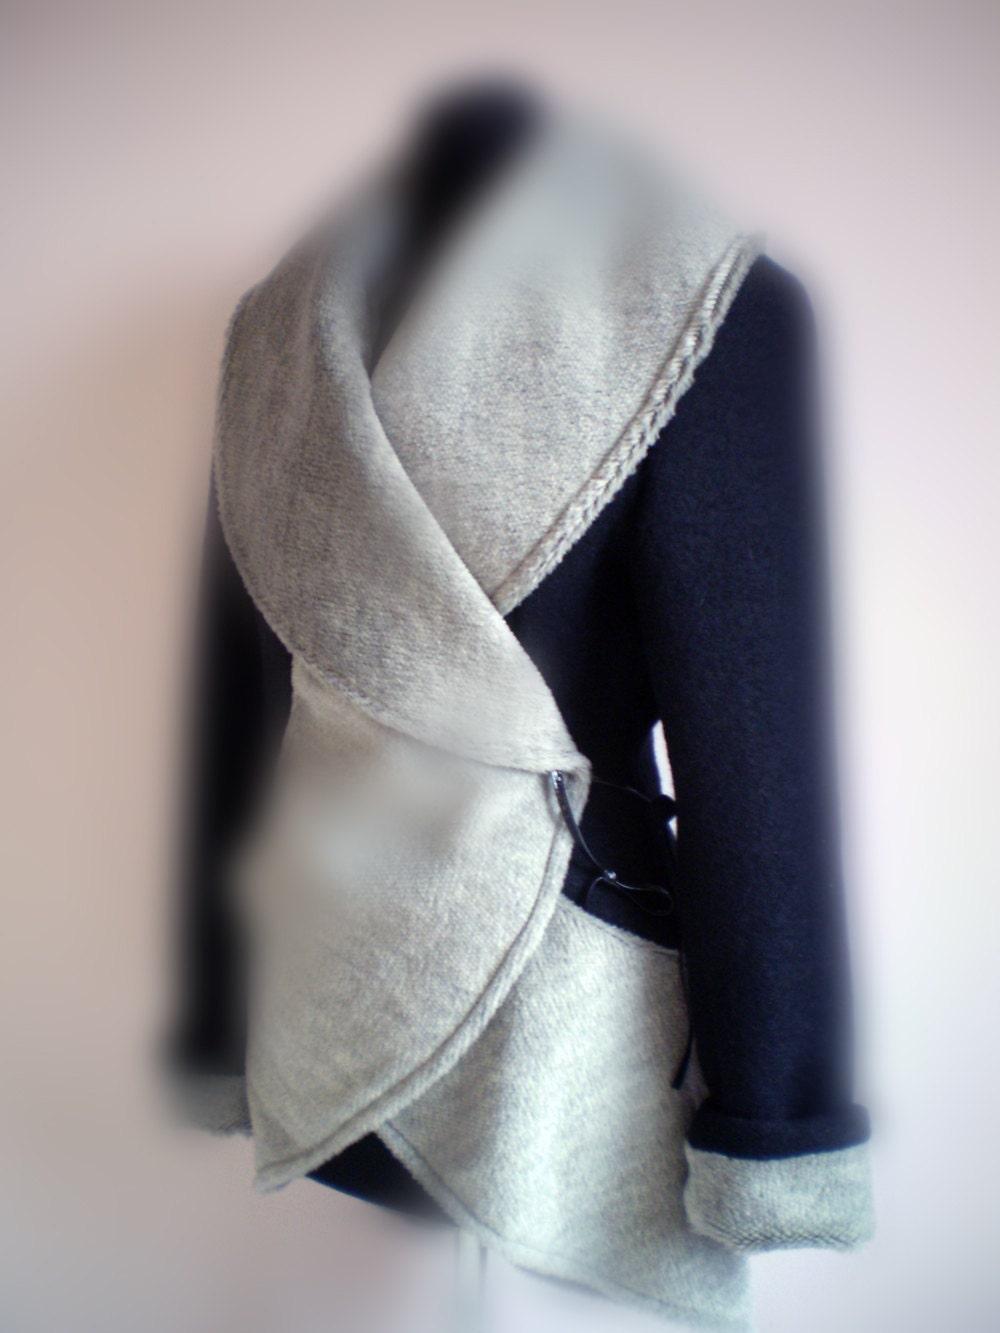 Wool jacket/coat-black and gray